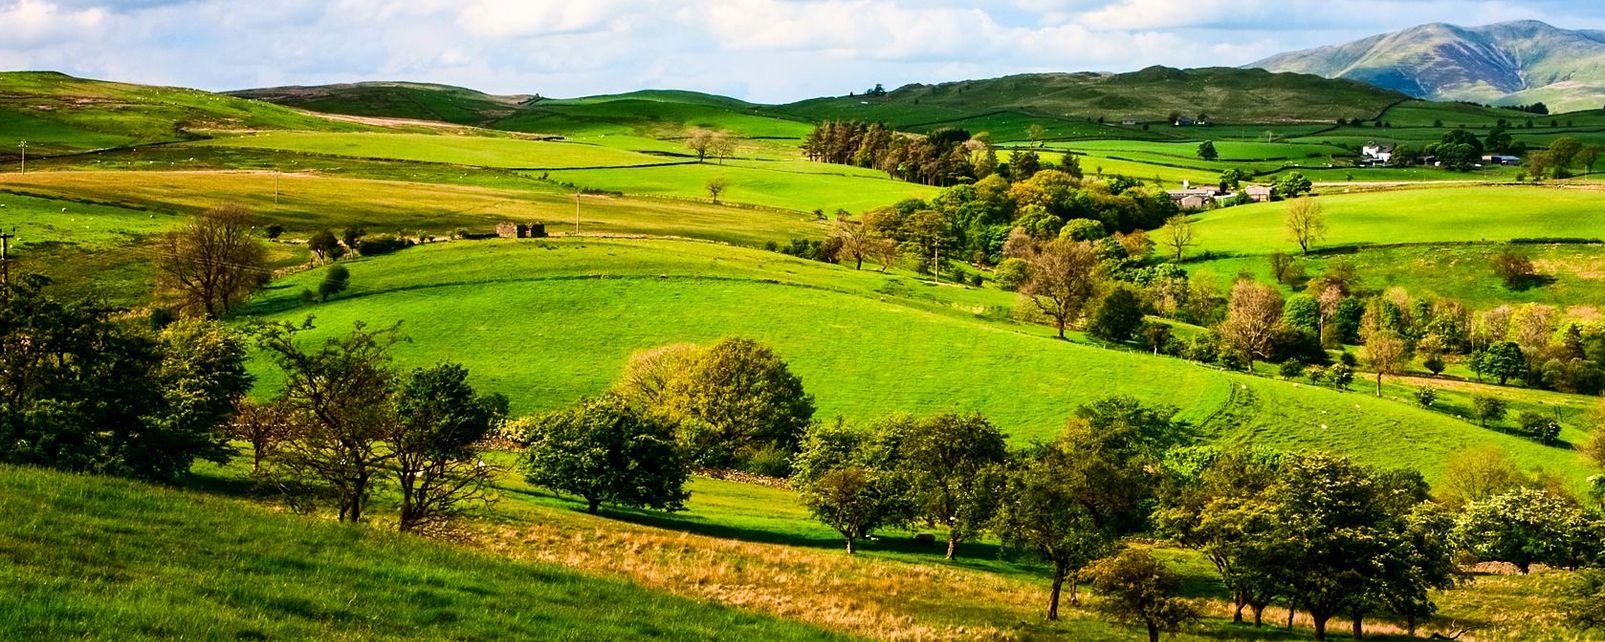 The Yorkshire Dales , United Kingdom